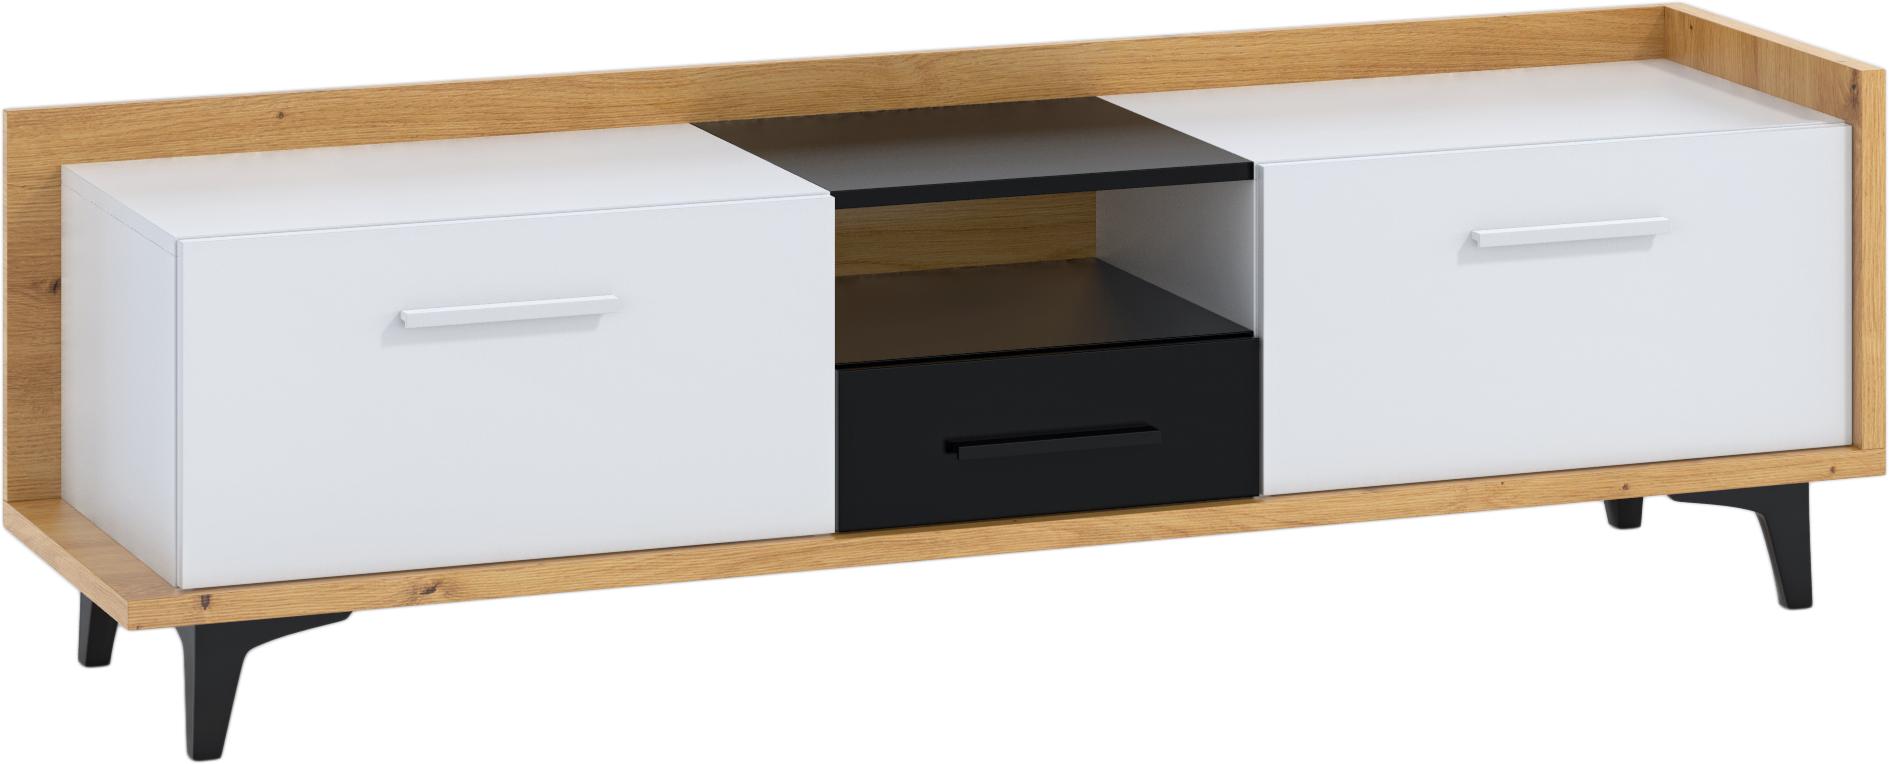 WIP TV stolík 2D1S BOX-09 Farba: dub artisan / biela / čierna